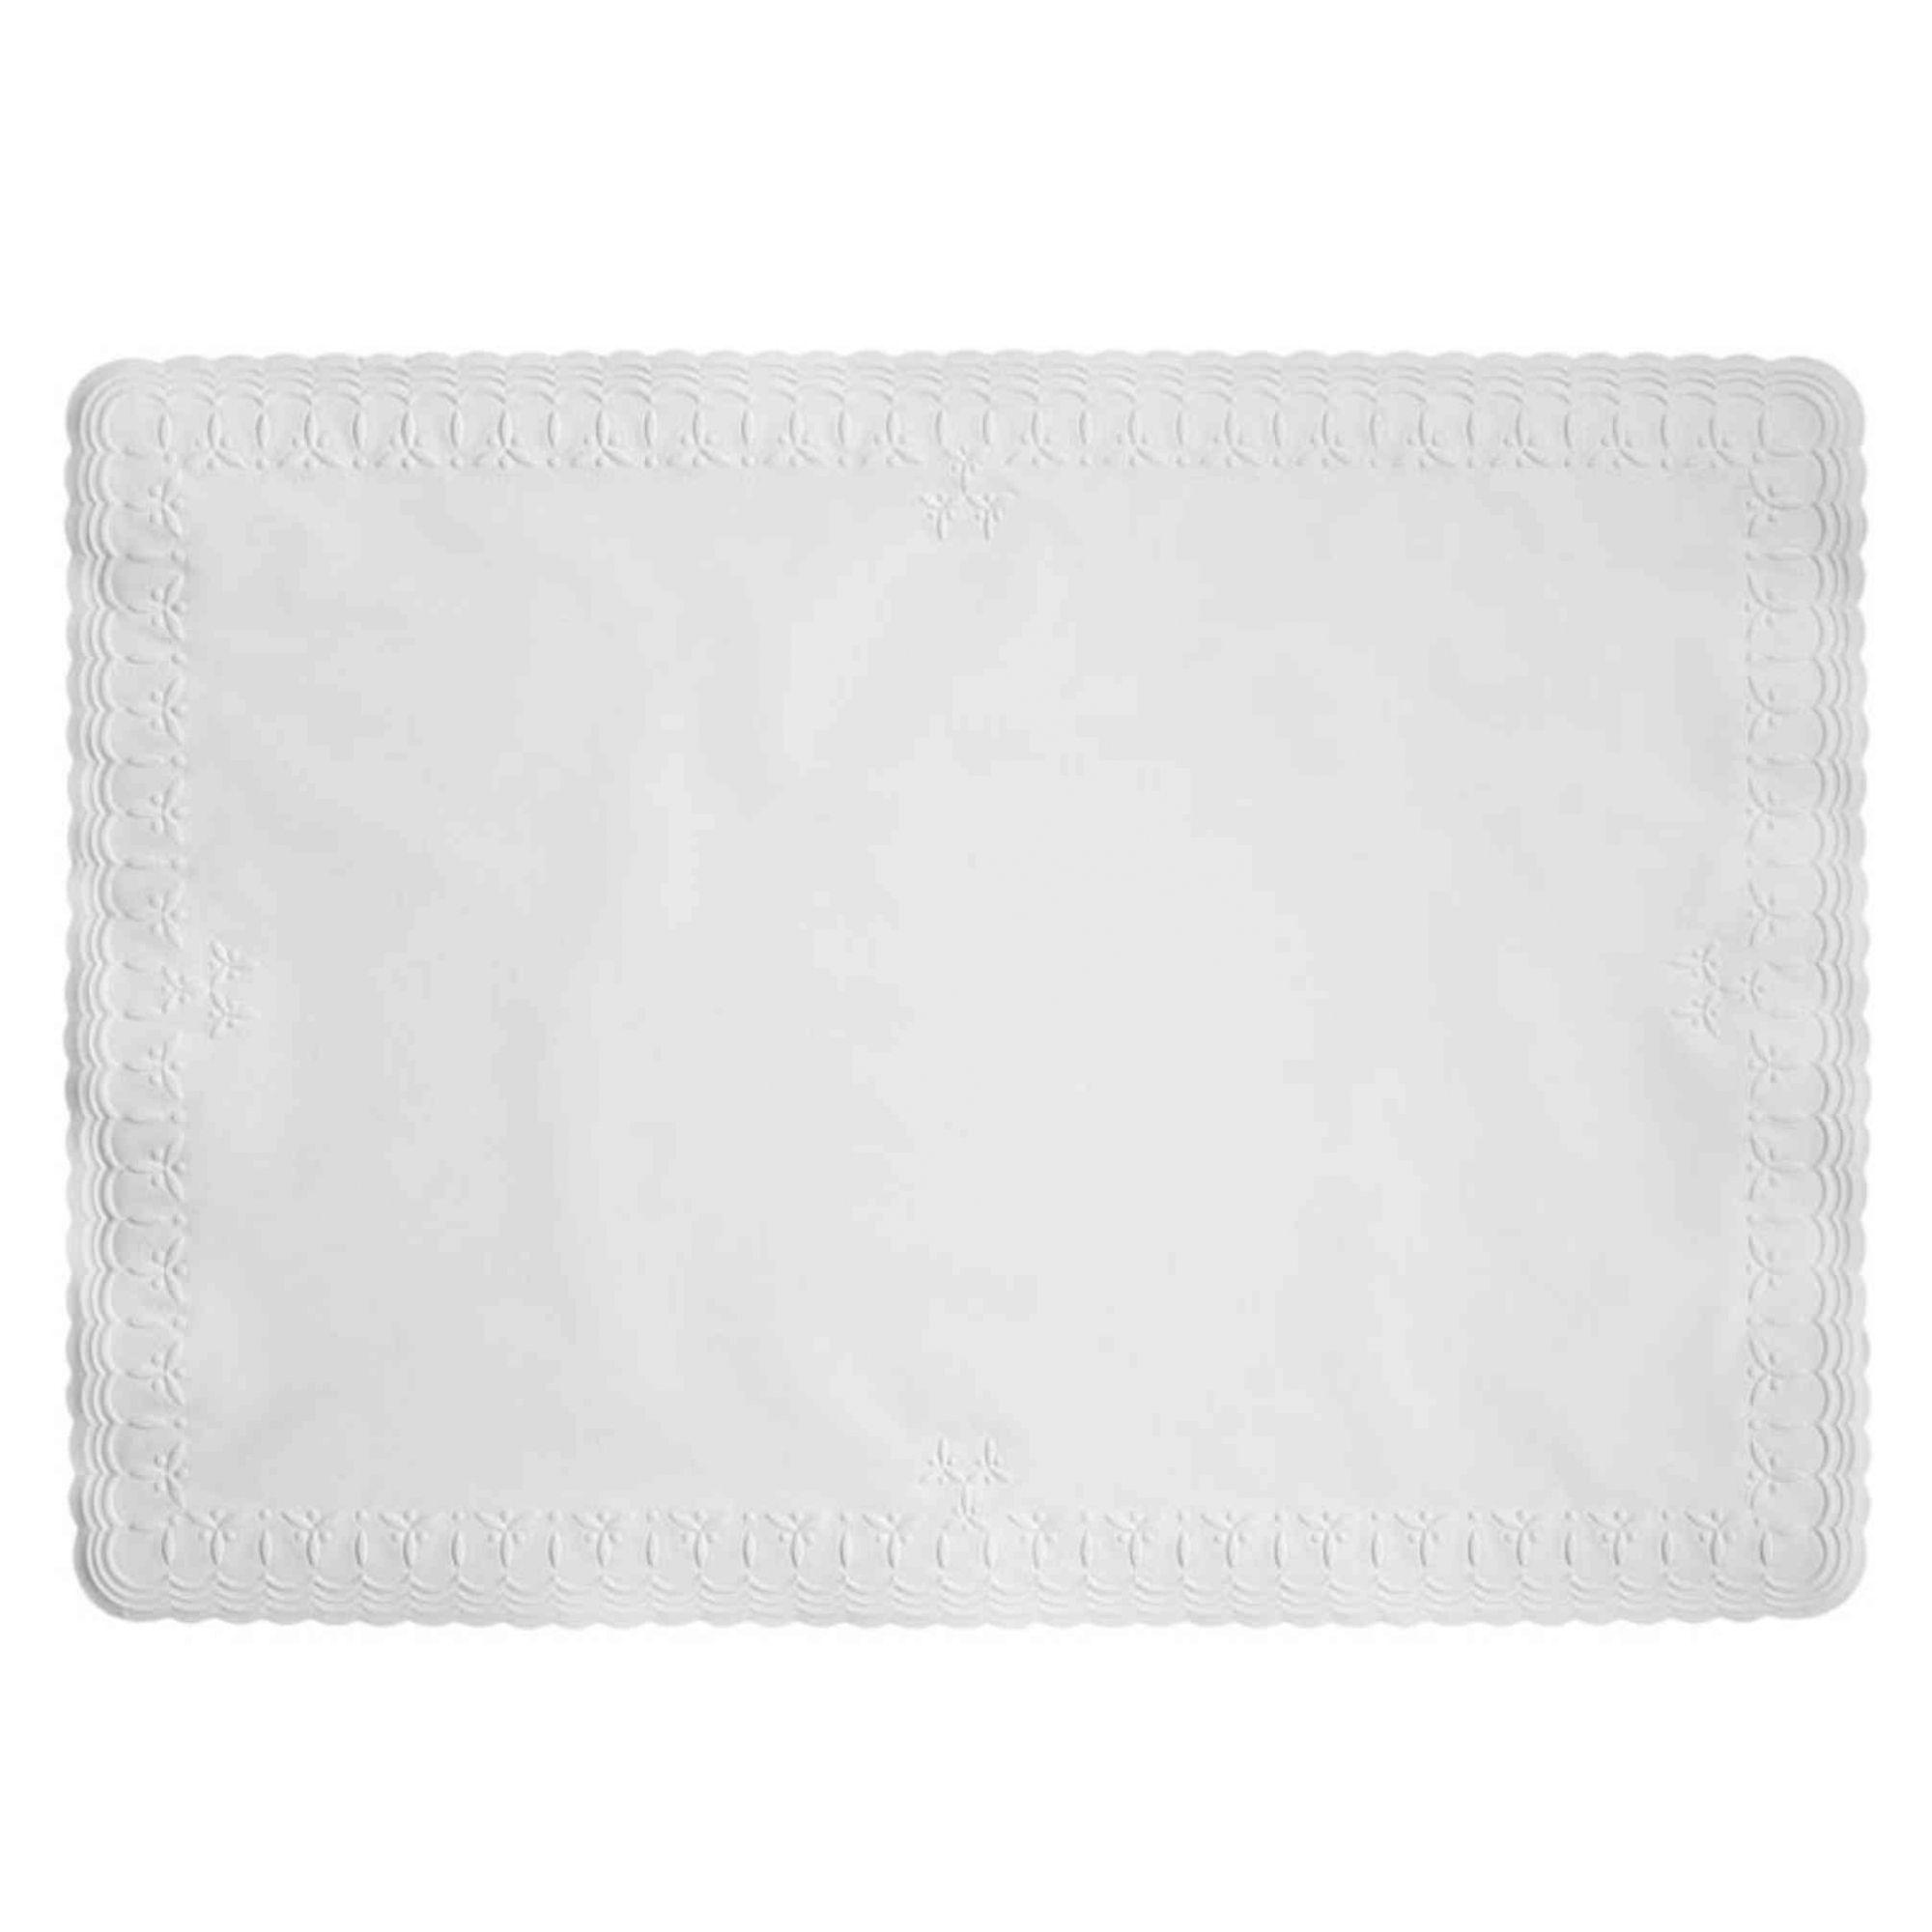 ab07f361ca3 Toalha de papel retangular para mesa posta / forro de bandeja Trevo 38x27  cm branco ...